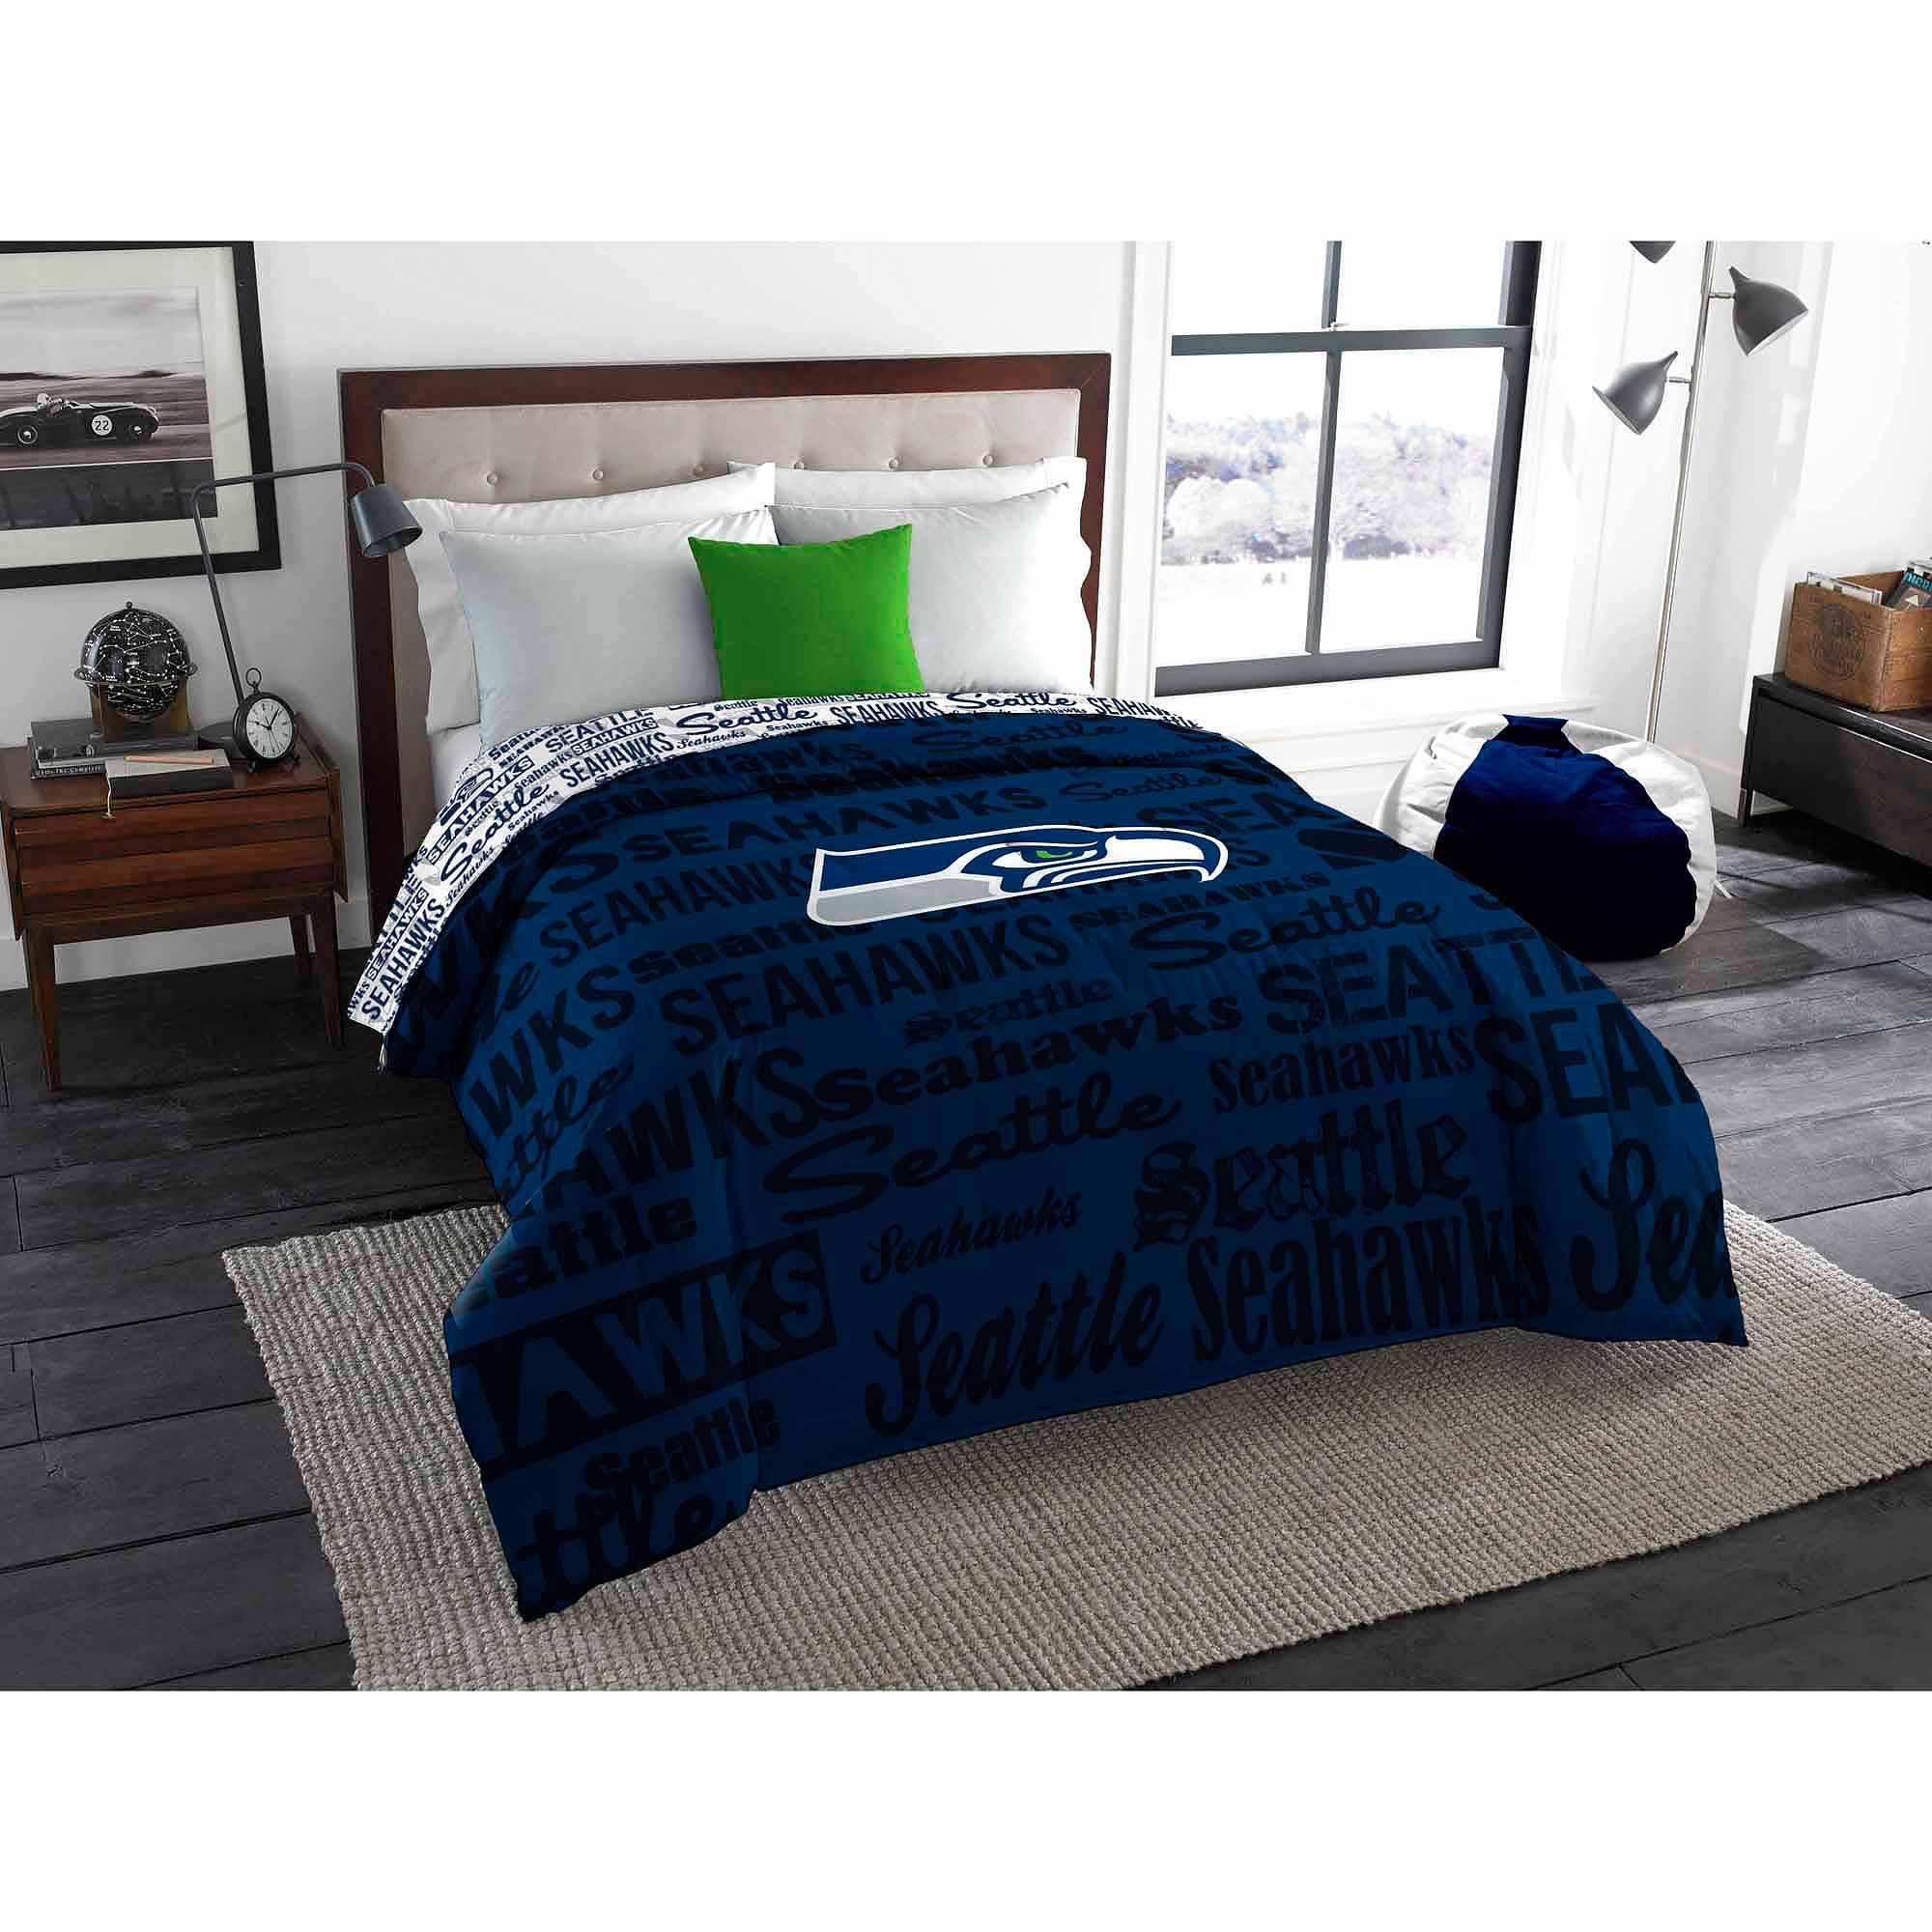 NFL Seattle Seahawks Twin/Full Bedding Comforter